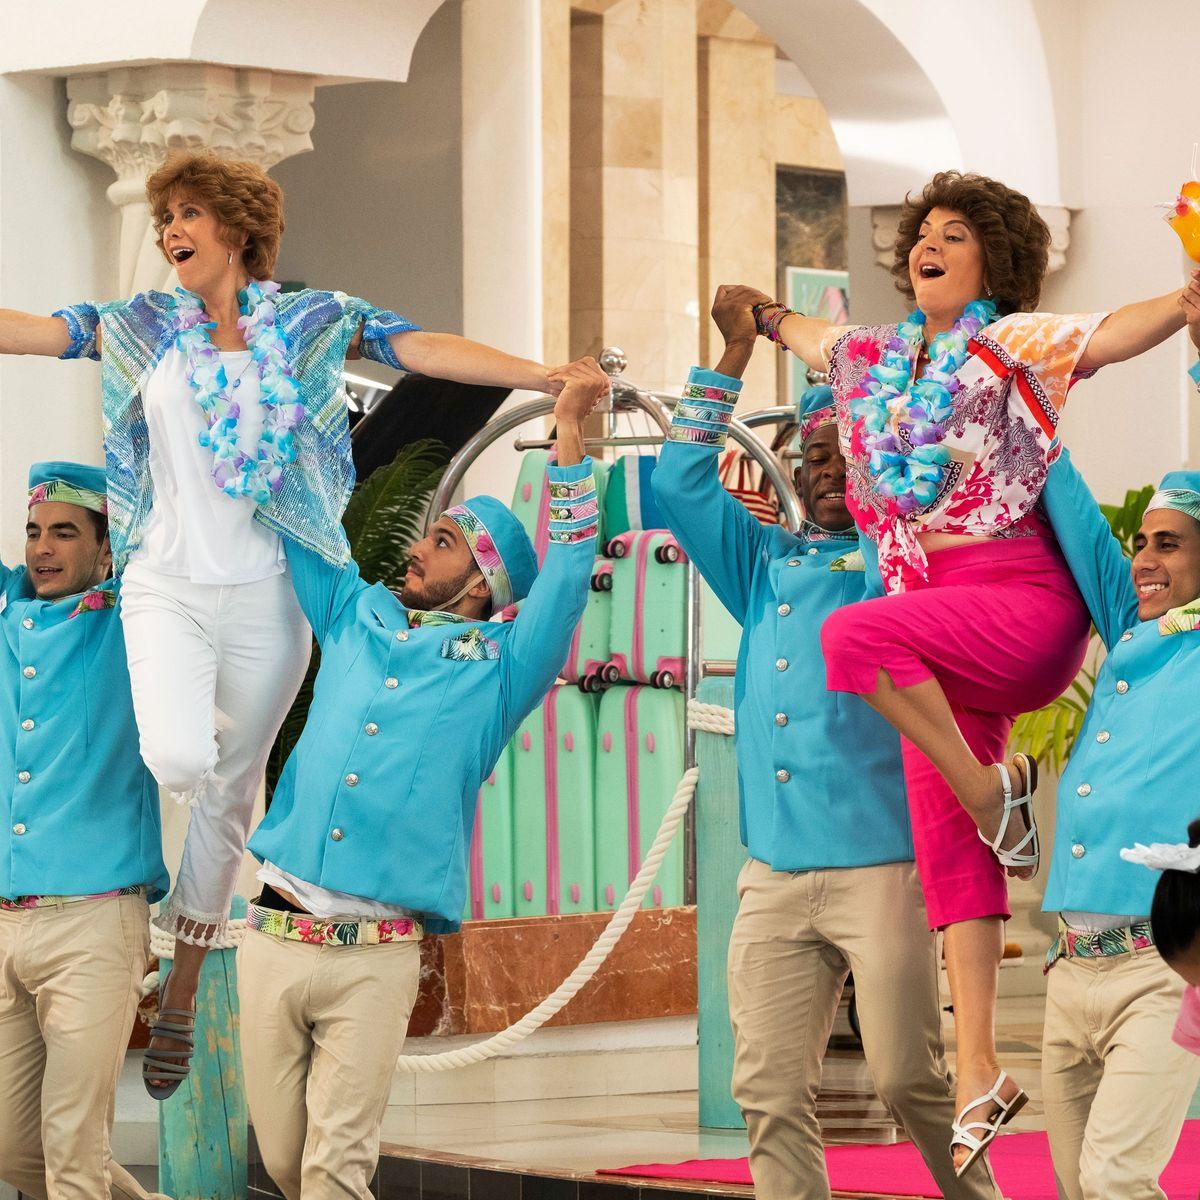 Film Review: Barb & Star Go to Vista del Mar w/ Kristen Wiig